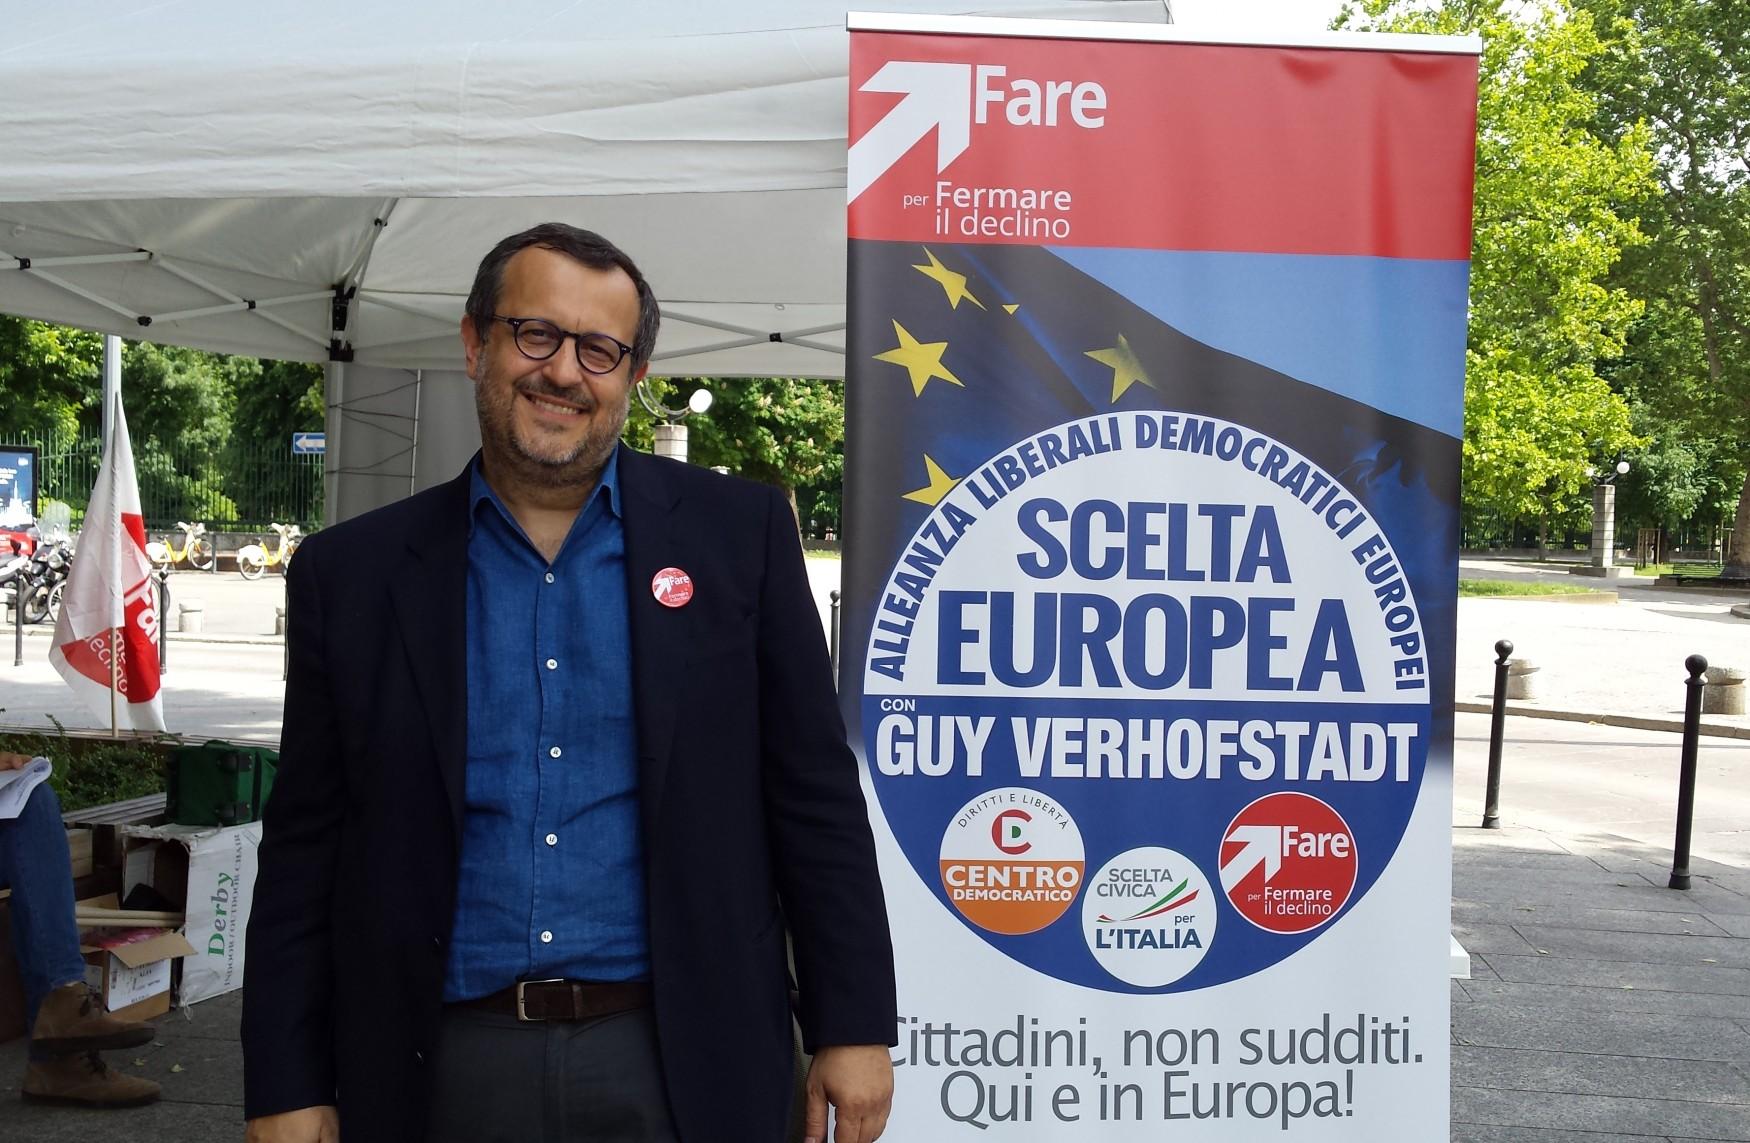 Paolo Marson